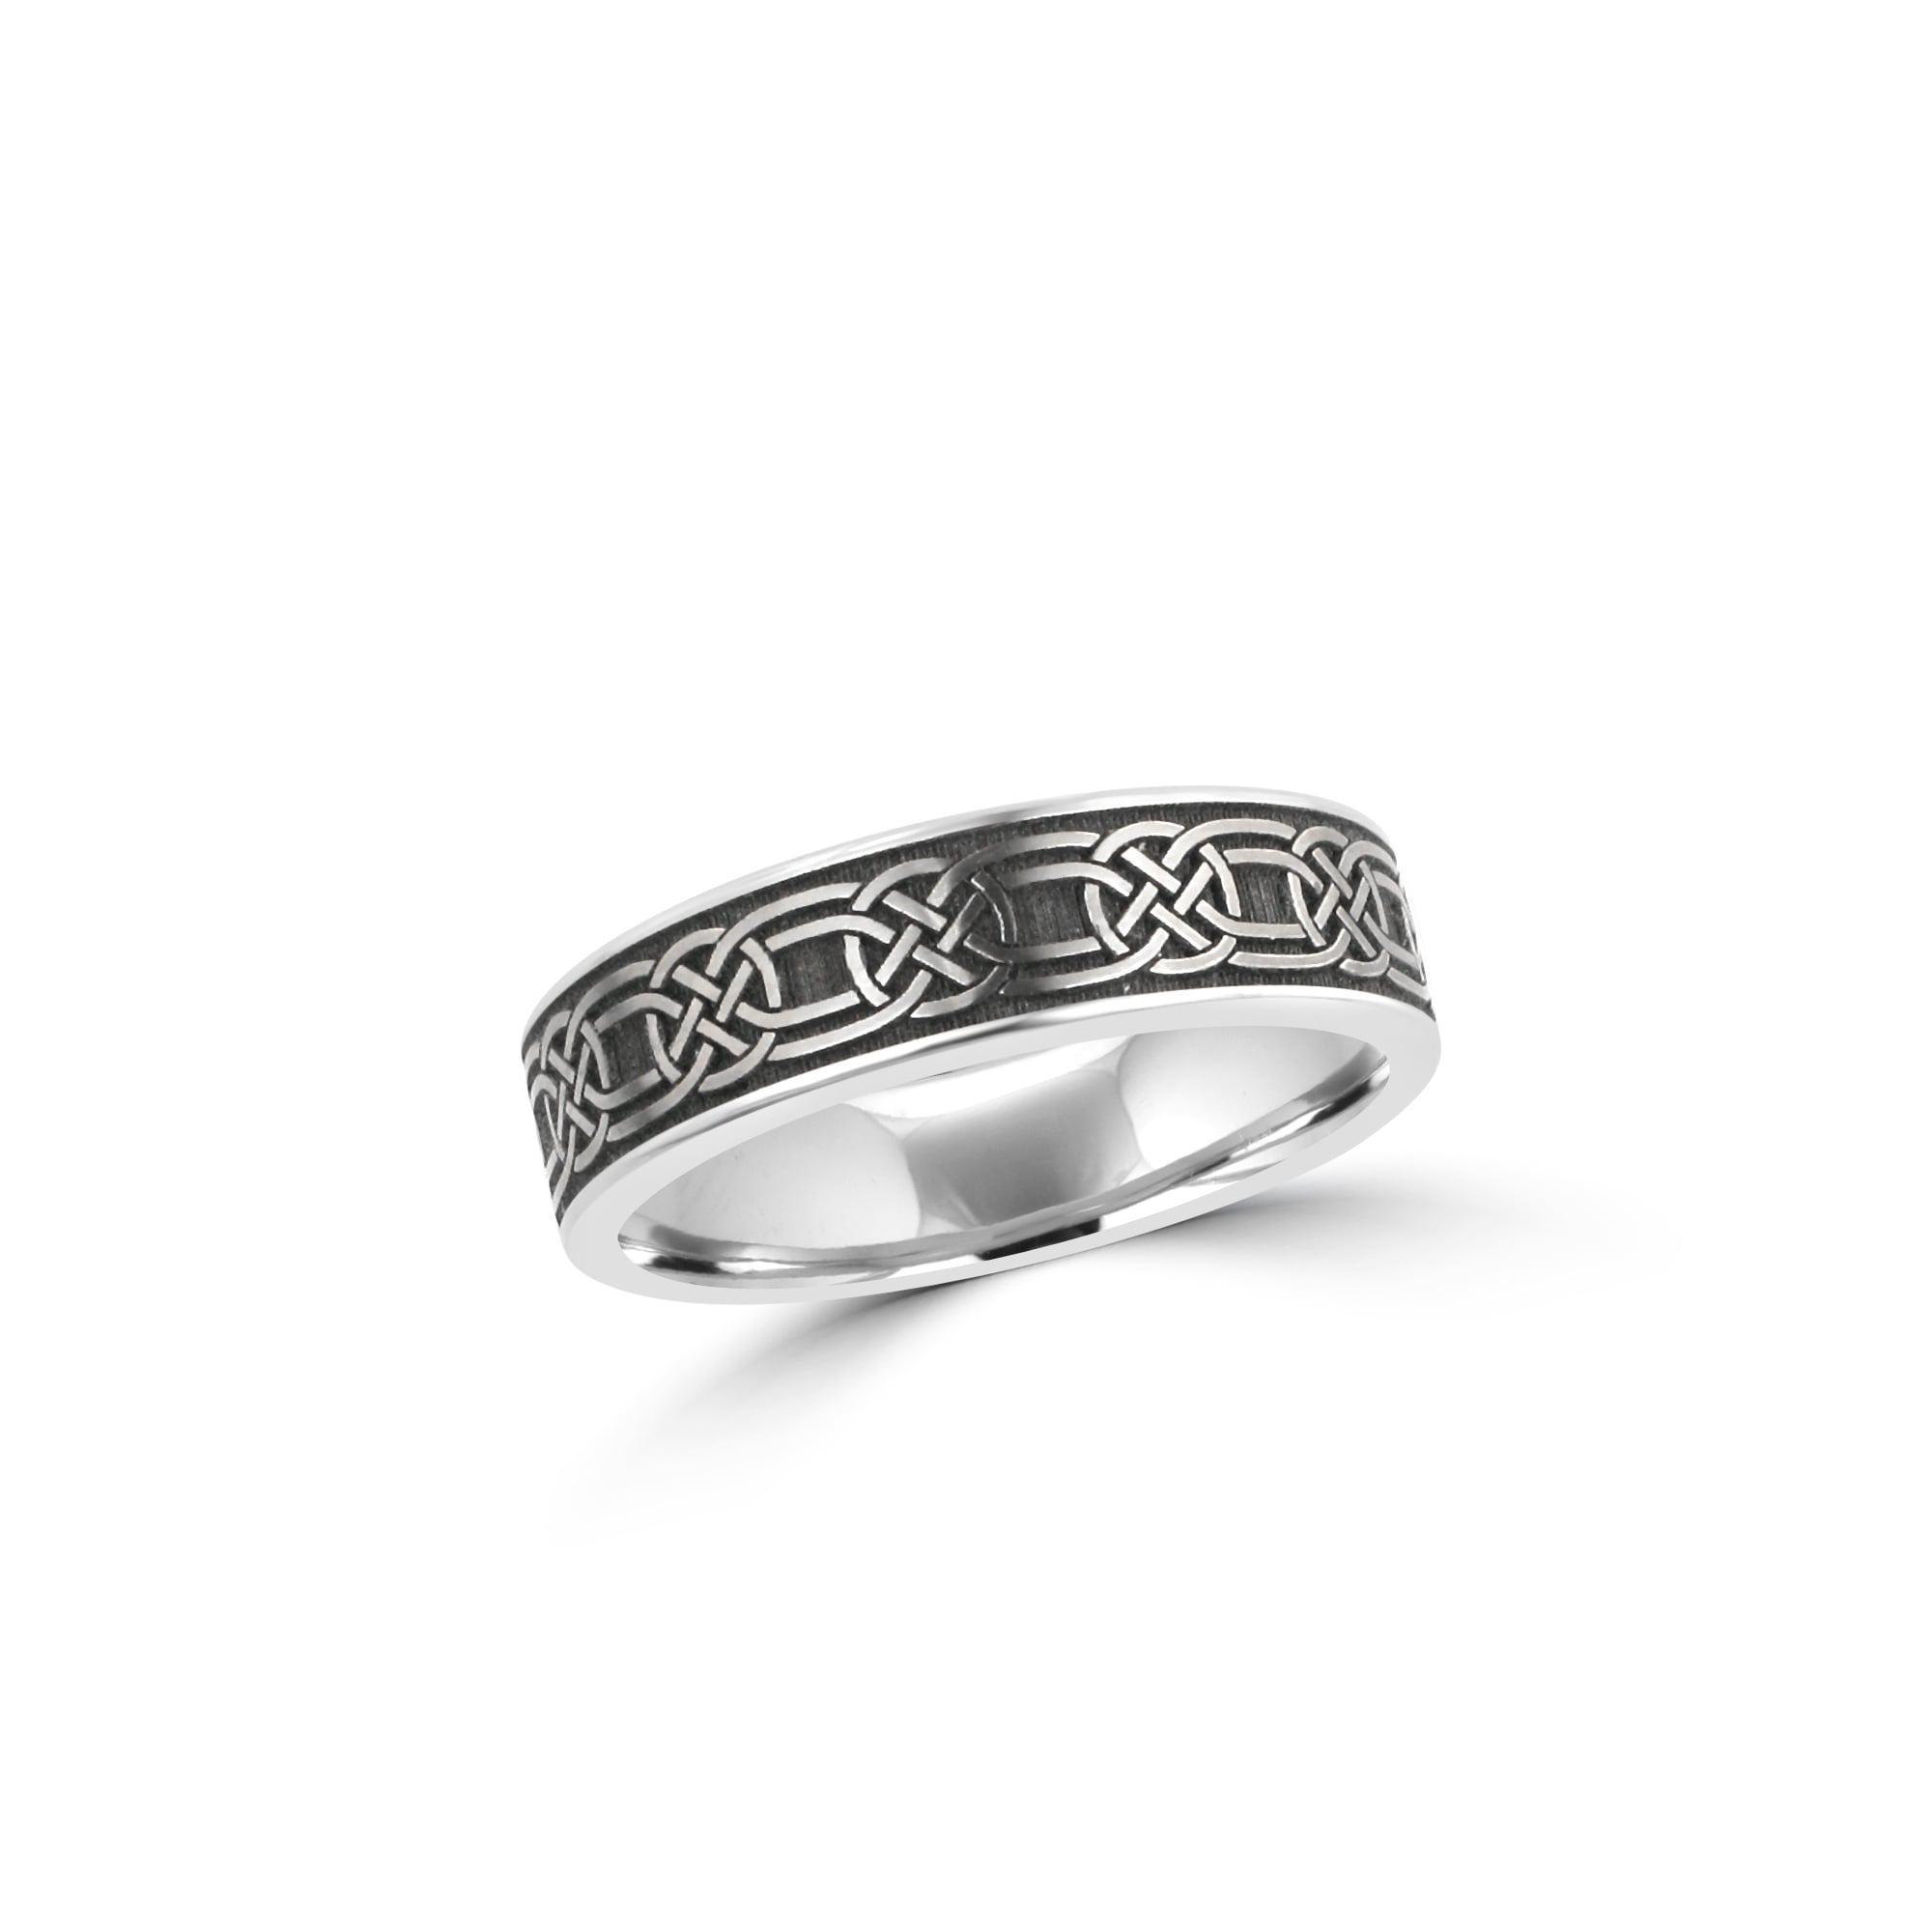 7mm Matt Celtic Pattern Titanium Wedding Ring With Polished Edges